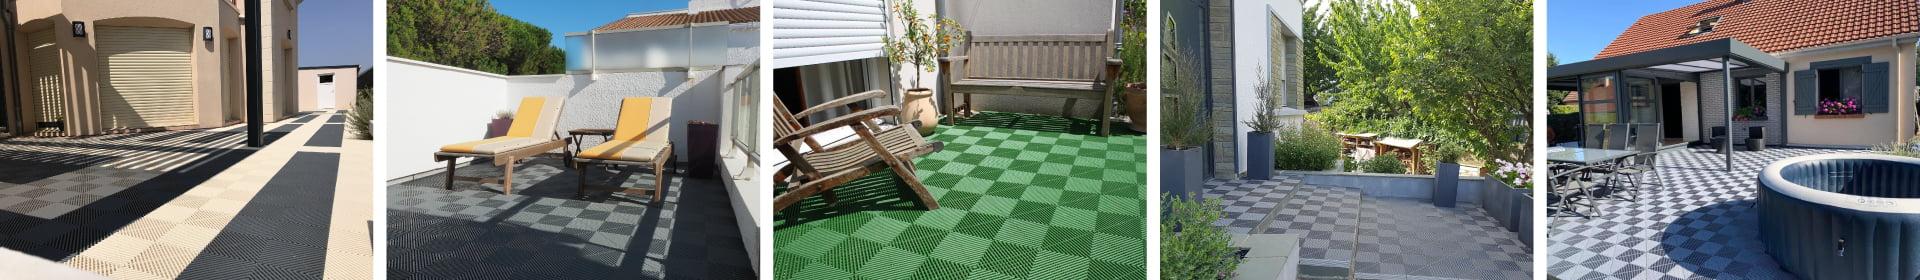 bandeau-page-terrasse-et-jardin